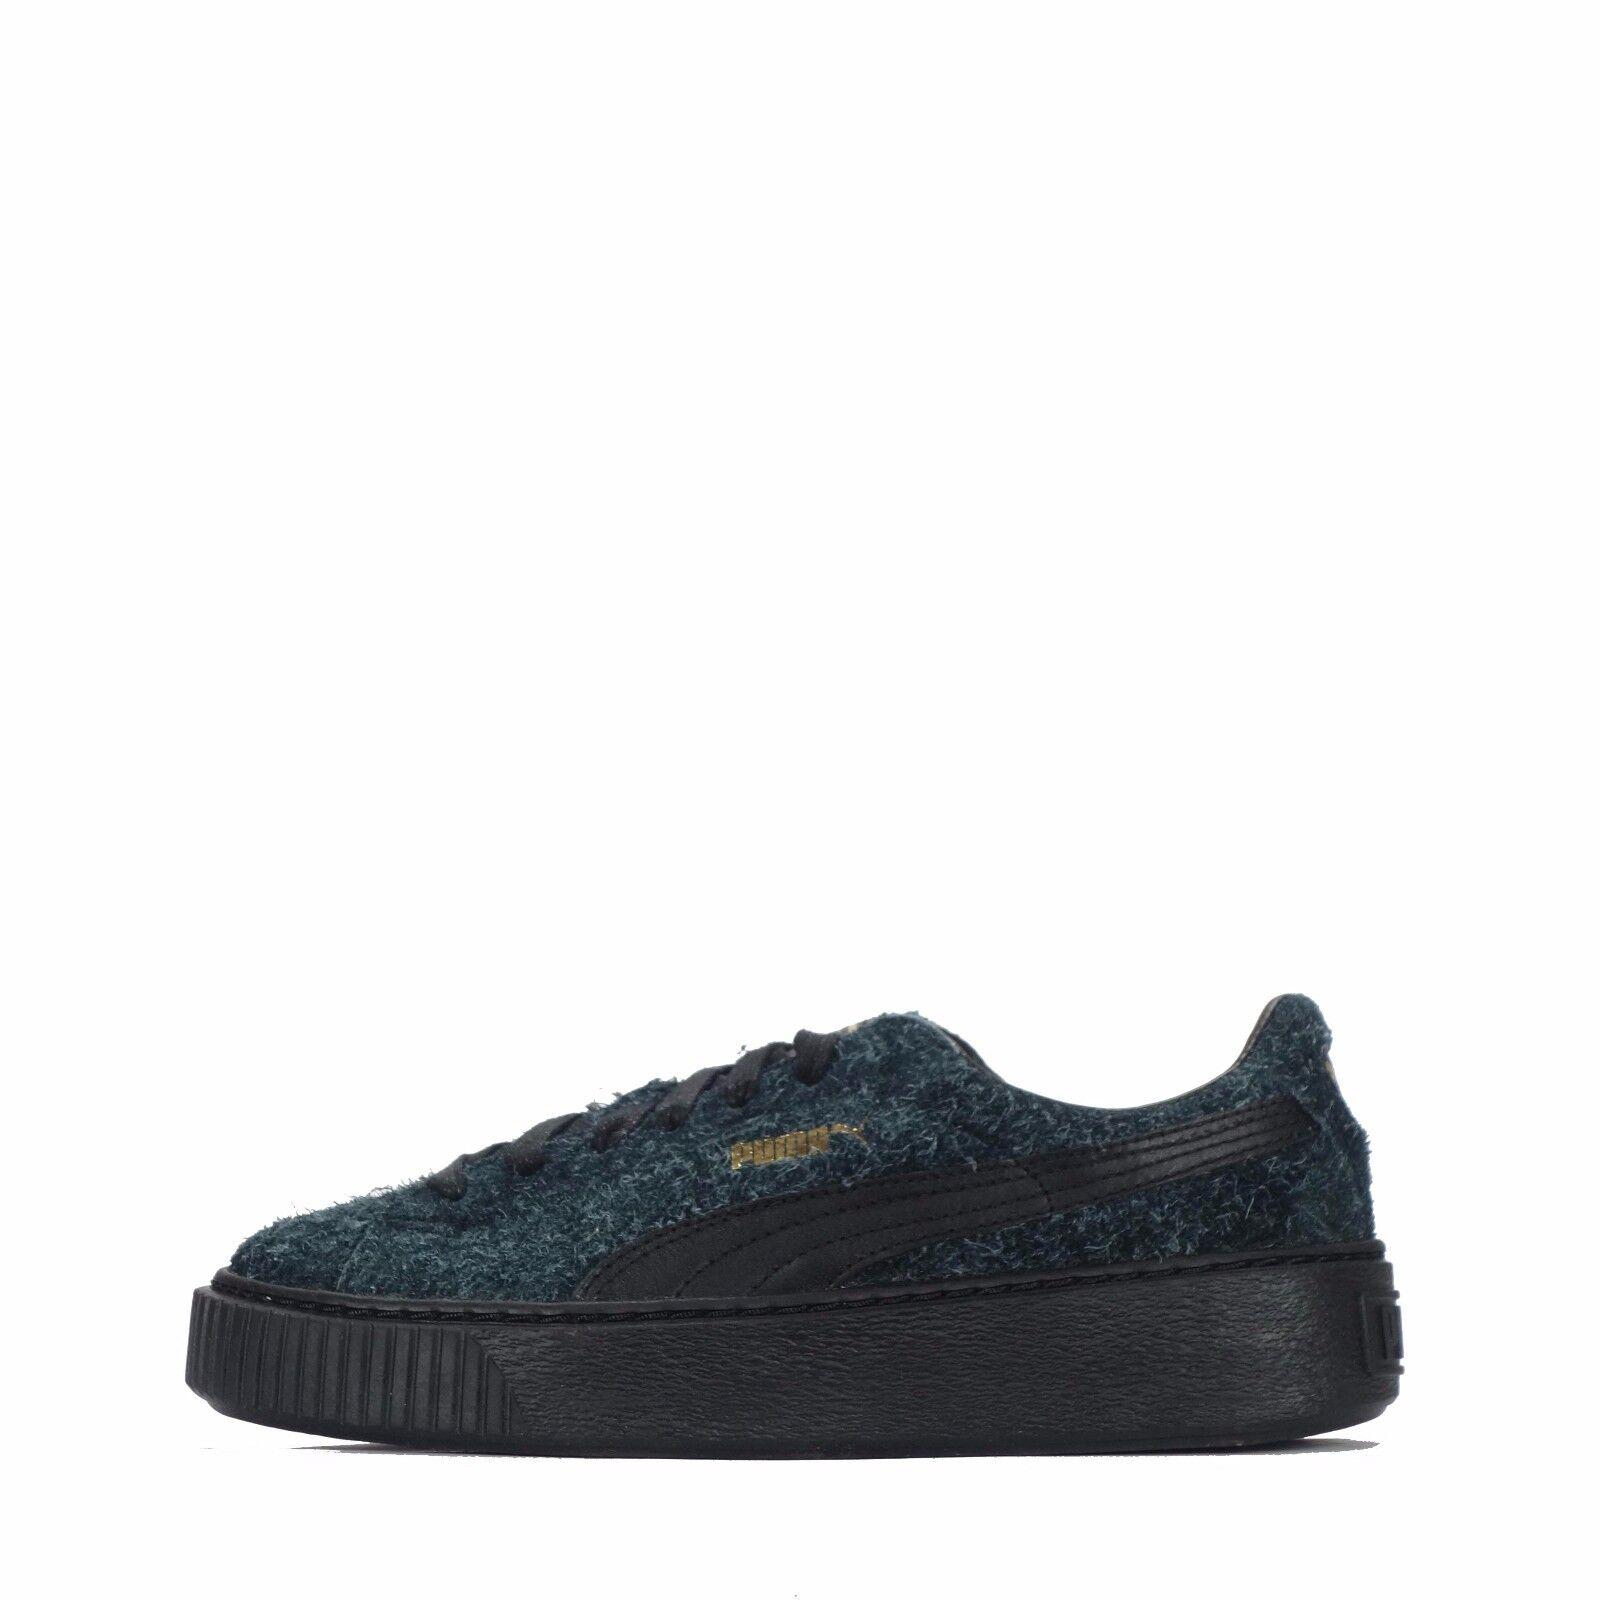 Puma Suede Platform Elemental / femmes Chaussures Noir / Elemental Noir 66ff53